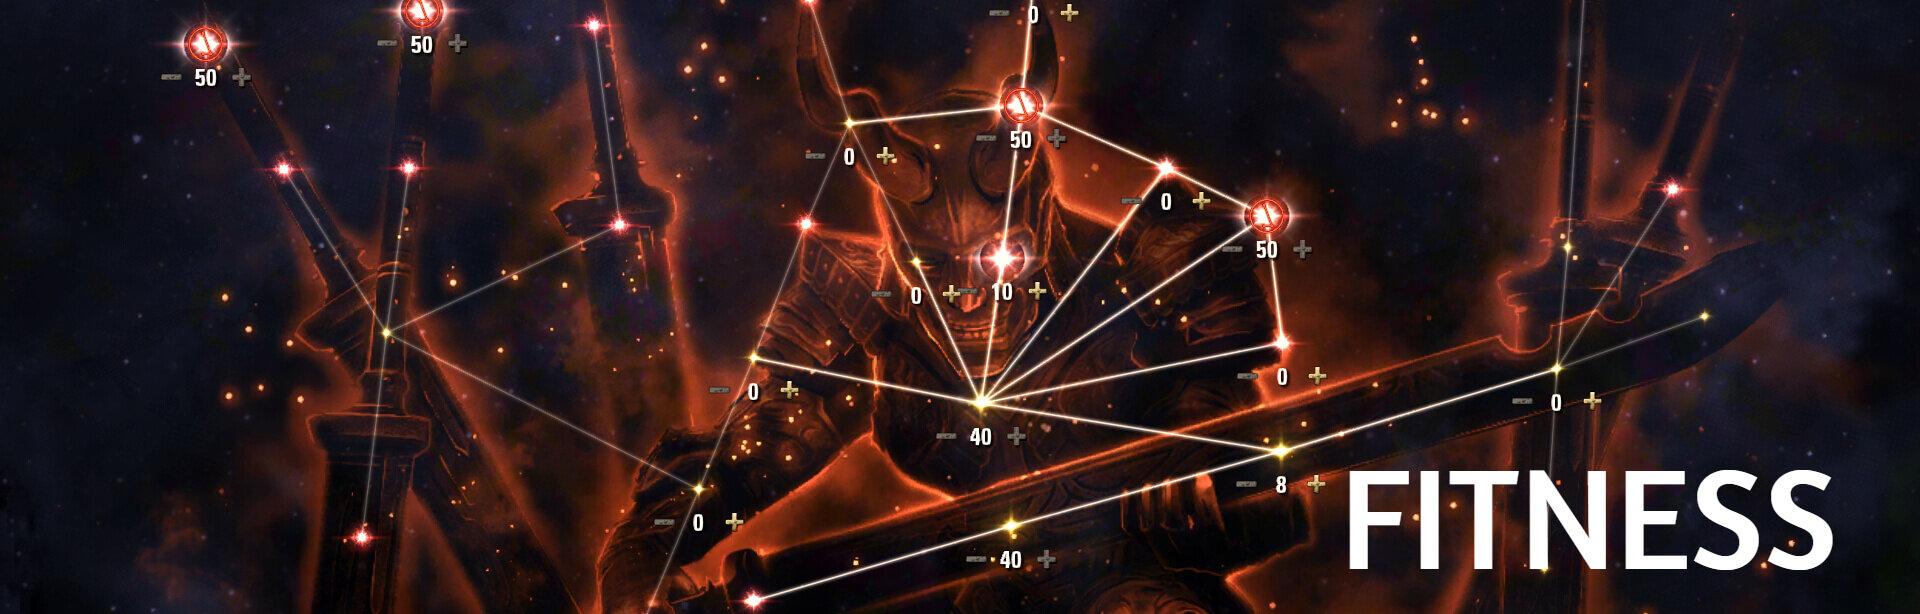 eso-fitness-constellation.jpg